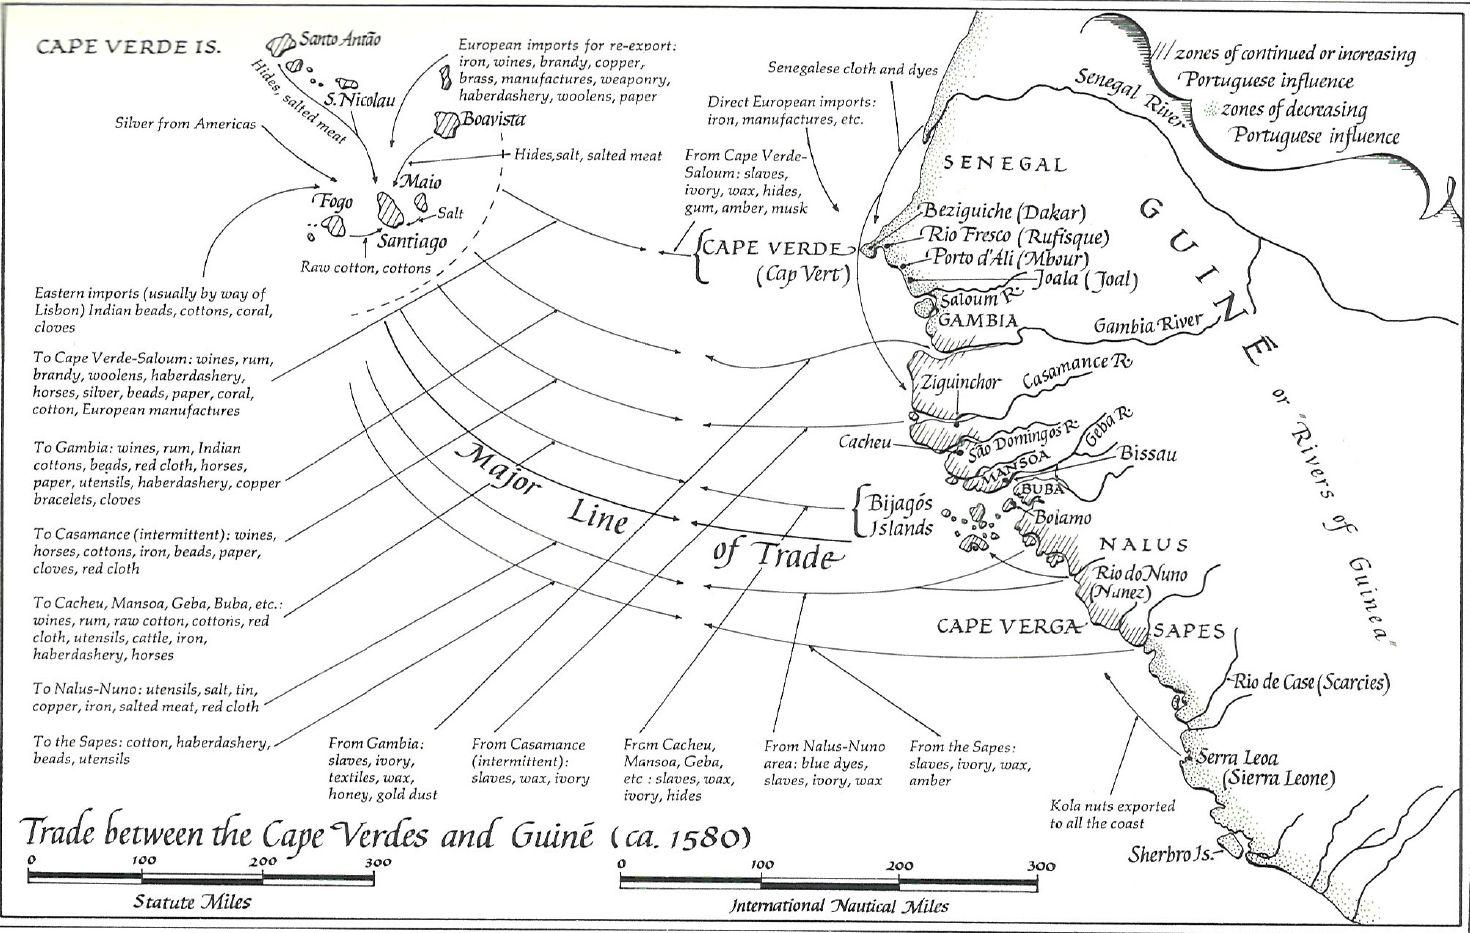 Trade between CV & Guine ca. 1580